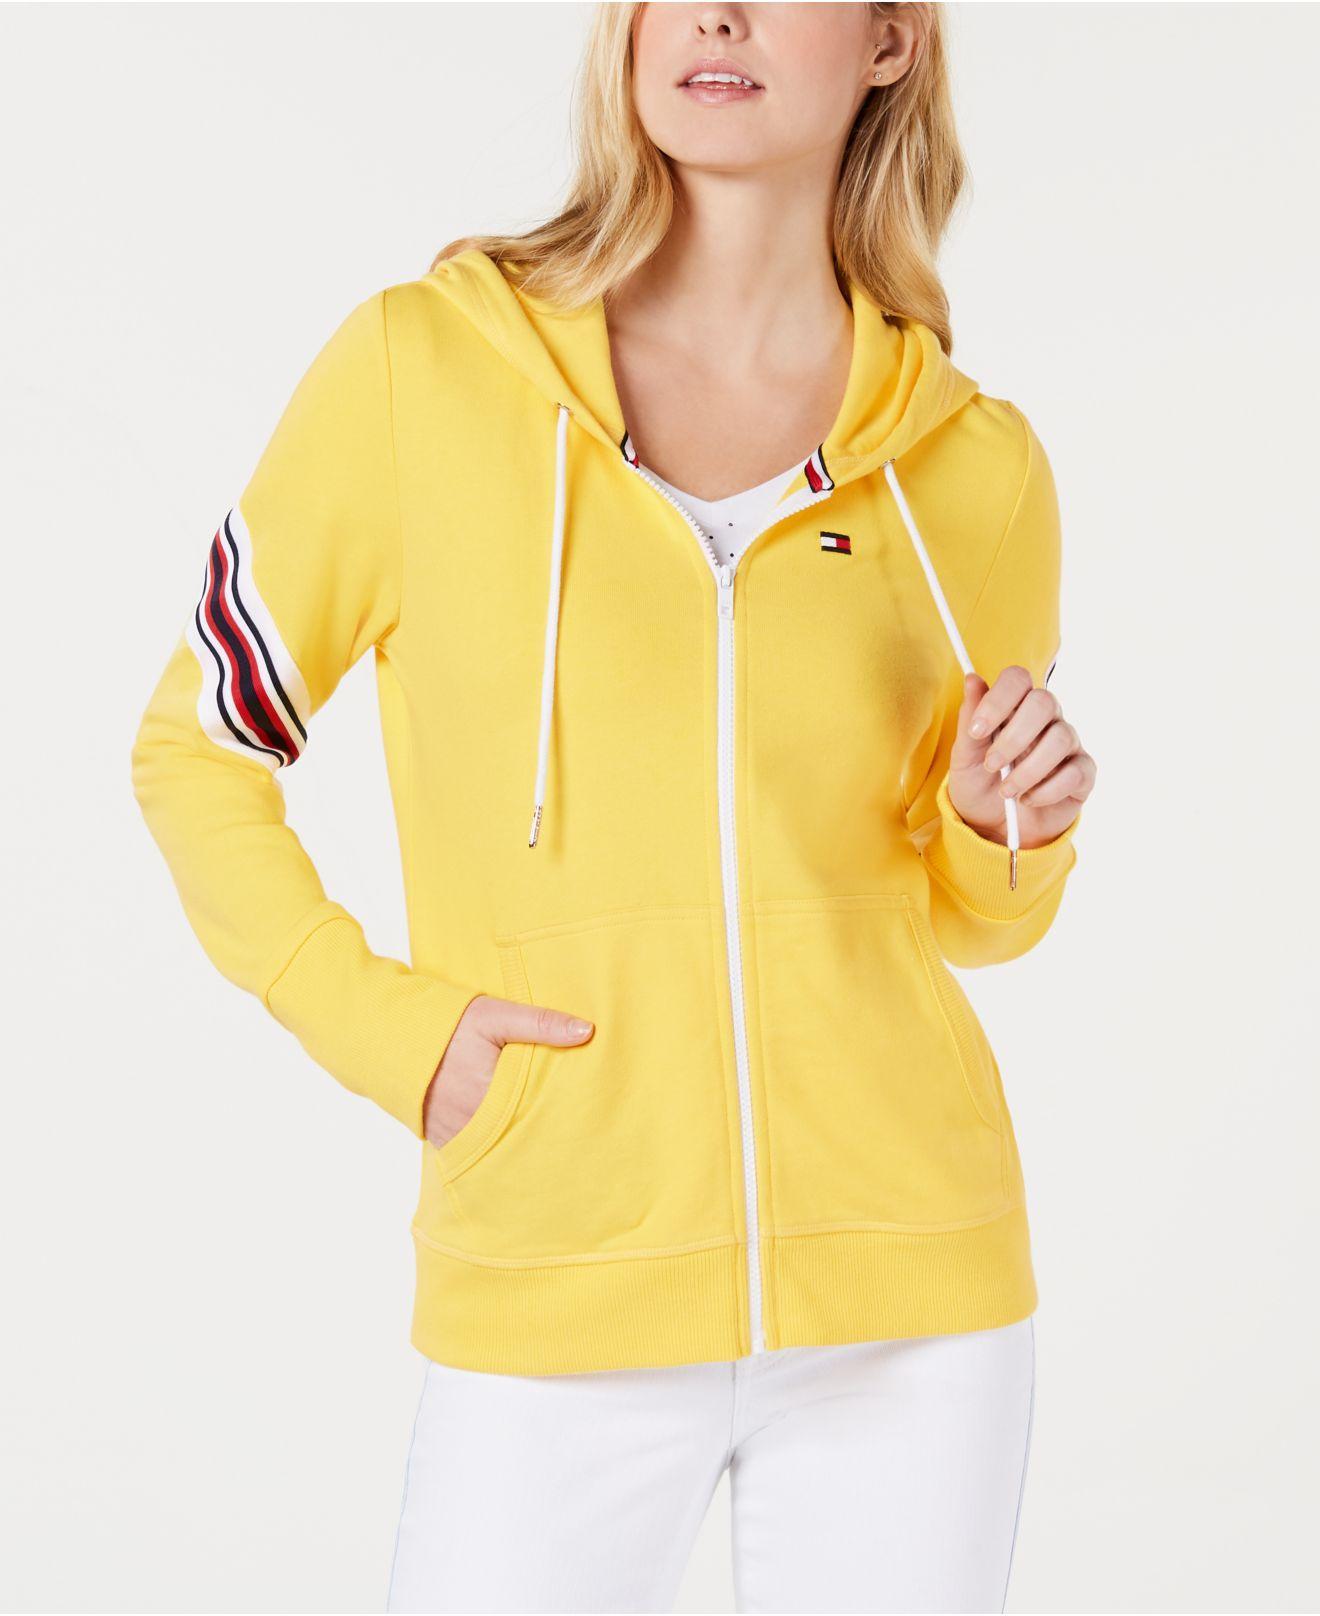 fd75df822 Lyst - Tommy Hilfiger Varsity Logo Hoodie in Yellow